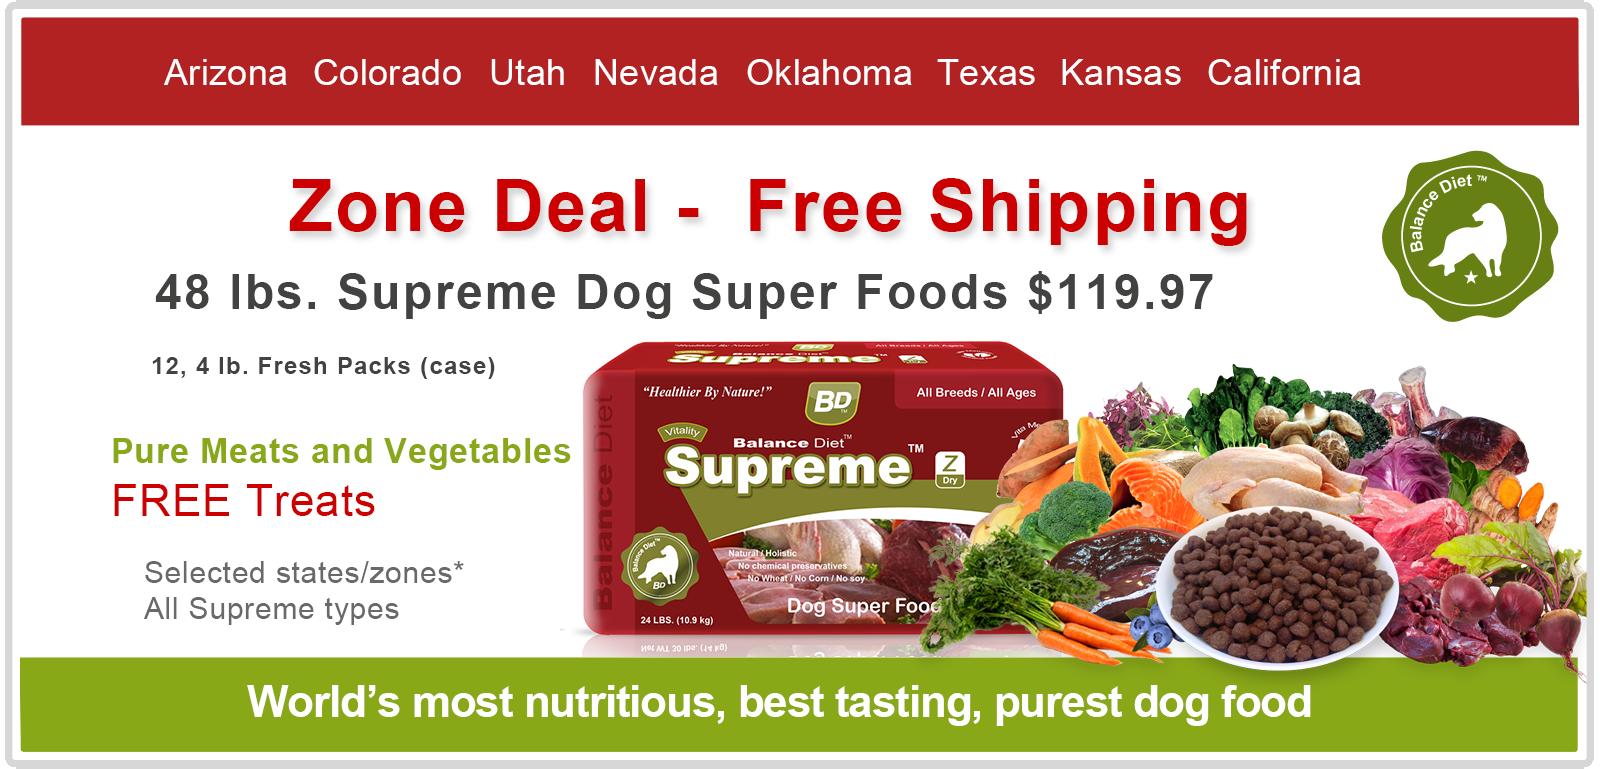 Balance Diet premium dog food most nutritious best tasting Dog Super fresh food for good health